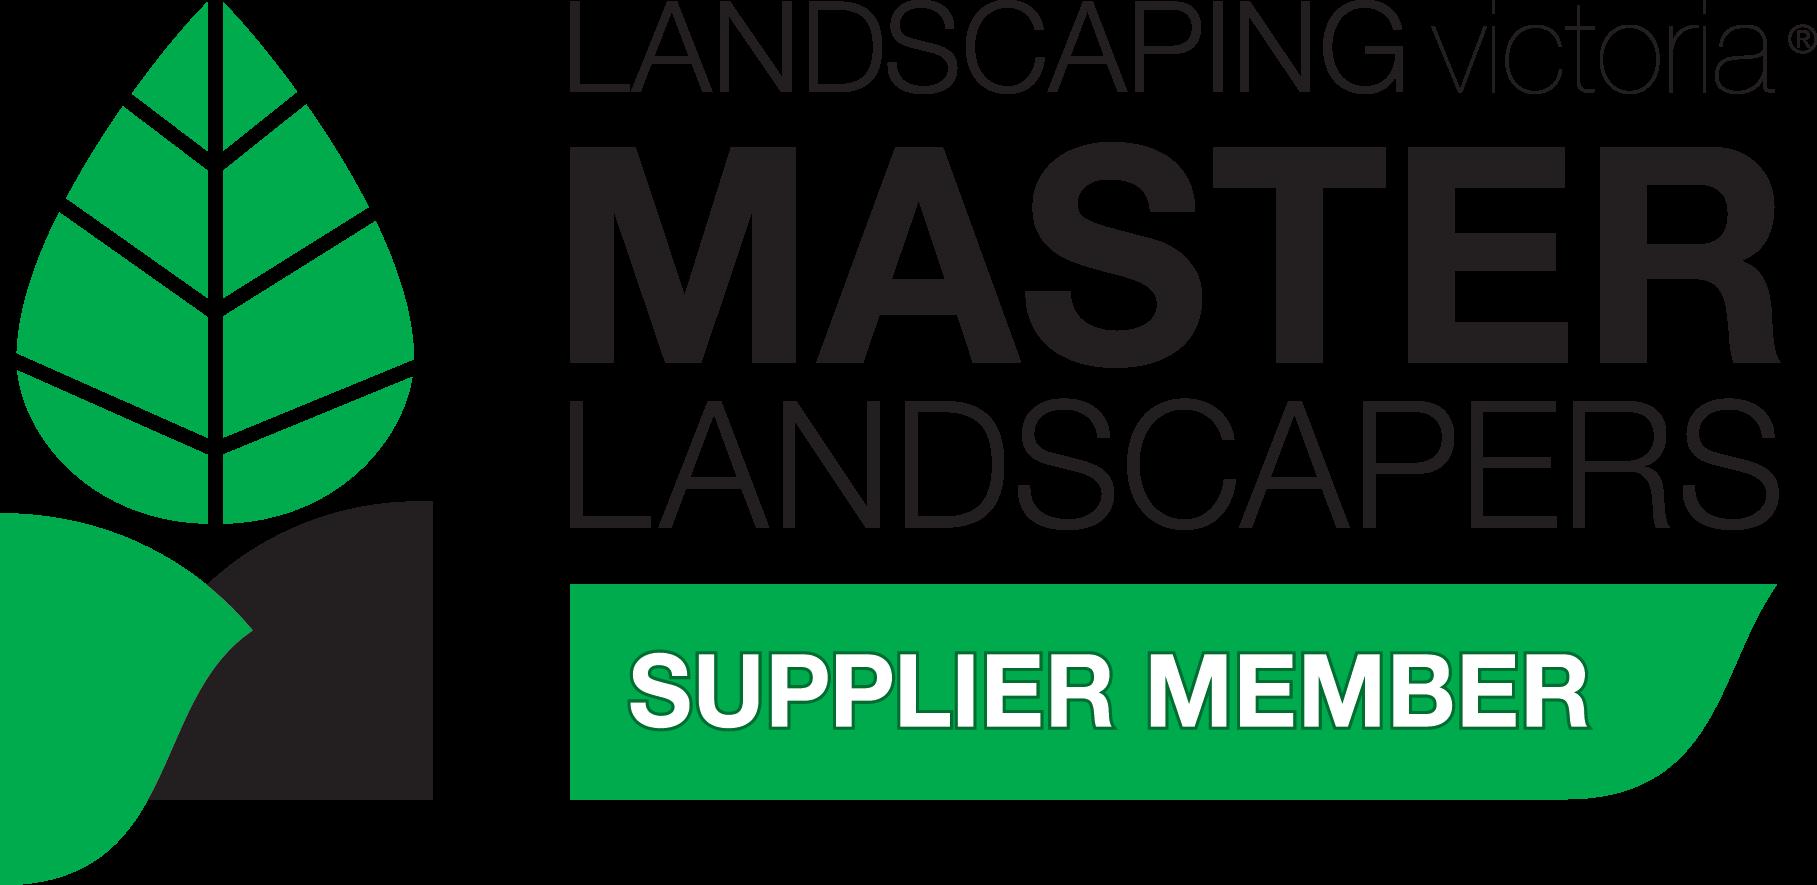 https://ballaustralia.com/wp-content/uploads/2020/12/LVLM_Supplier-Member-Logo-LVPC03s-conflicted-copy-2020-04-01.png